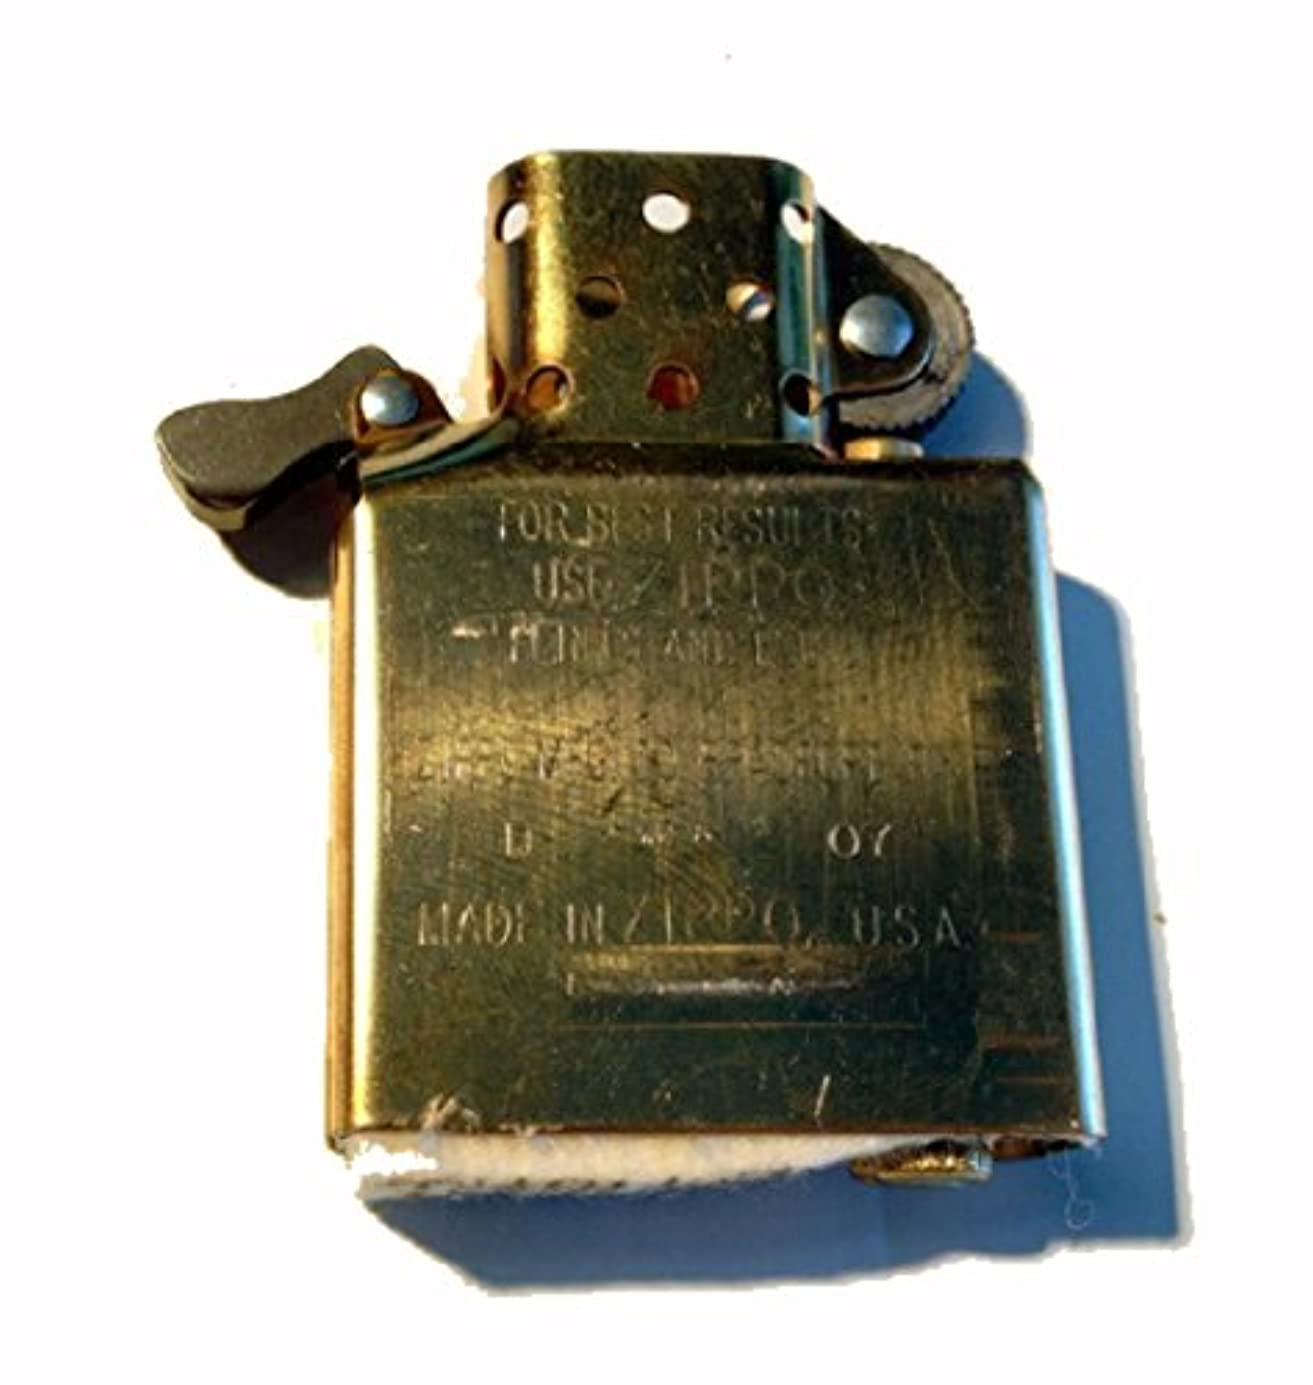 Zippo Inside Guts Brass Finish (No Outside Case) Only Inside wnhceg9629